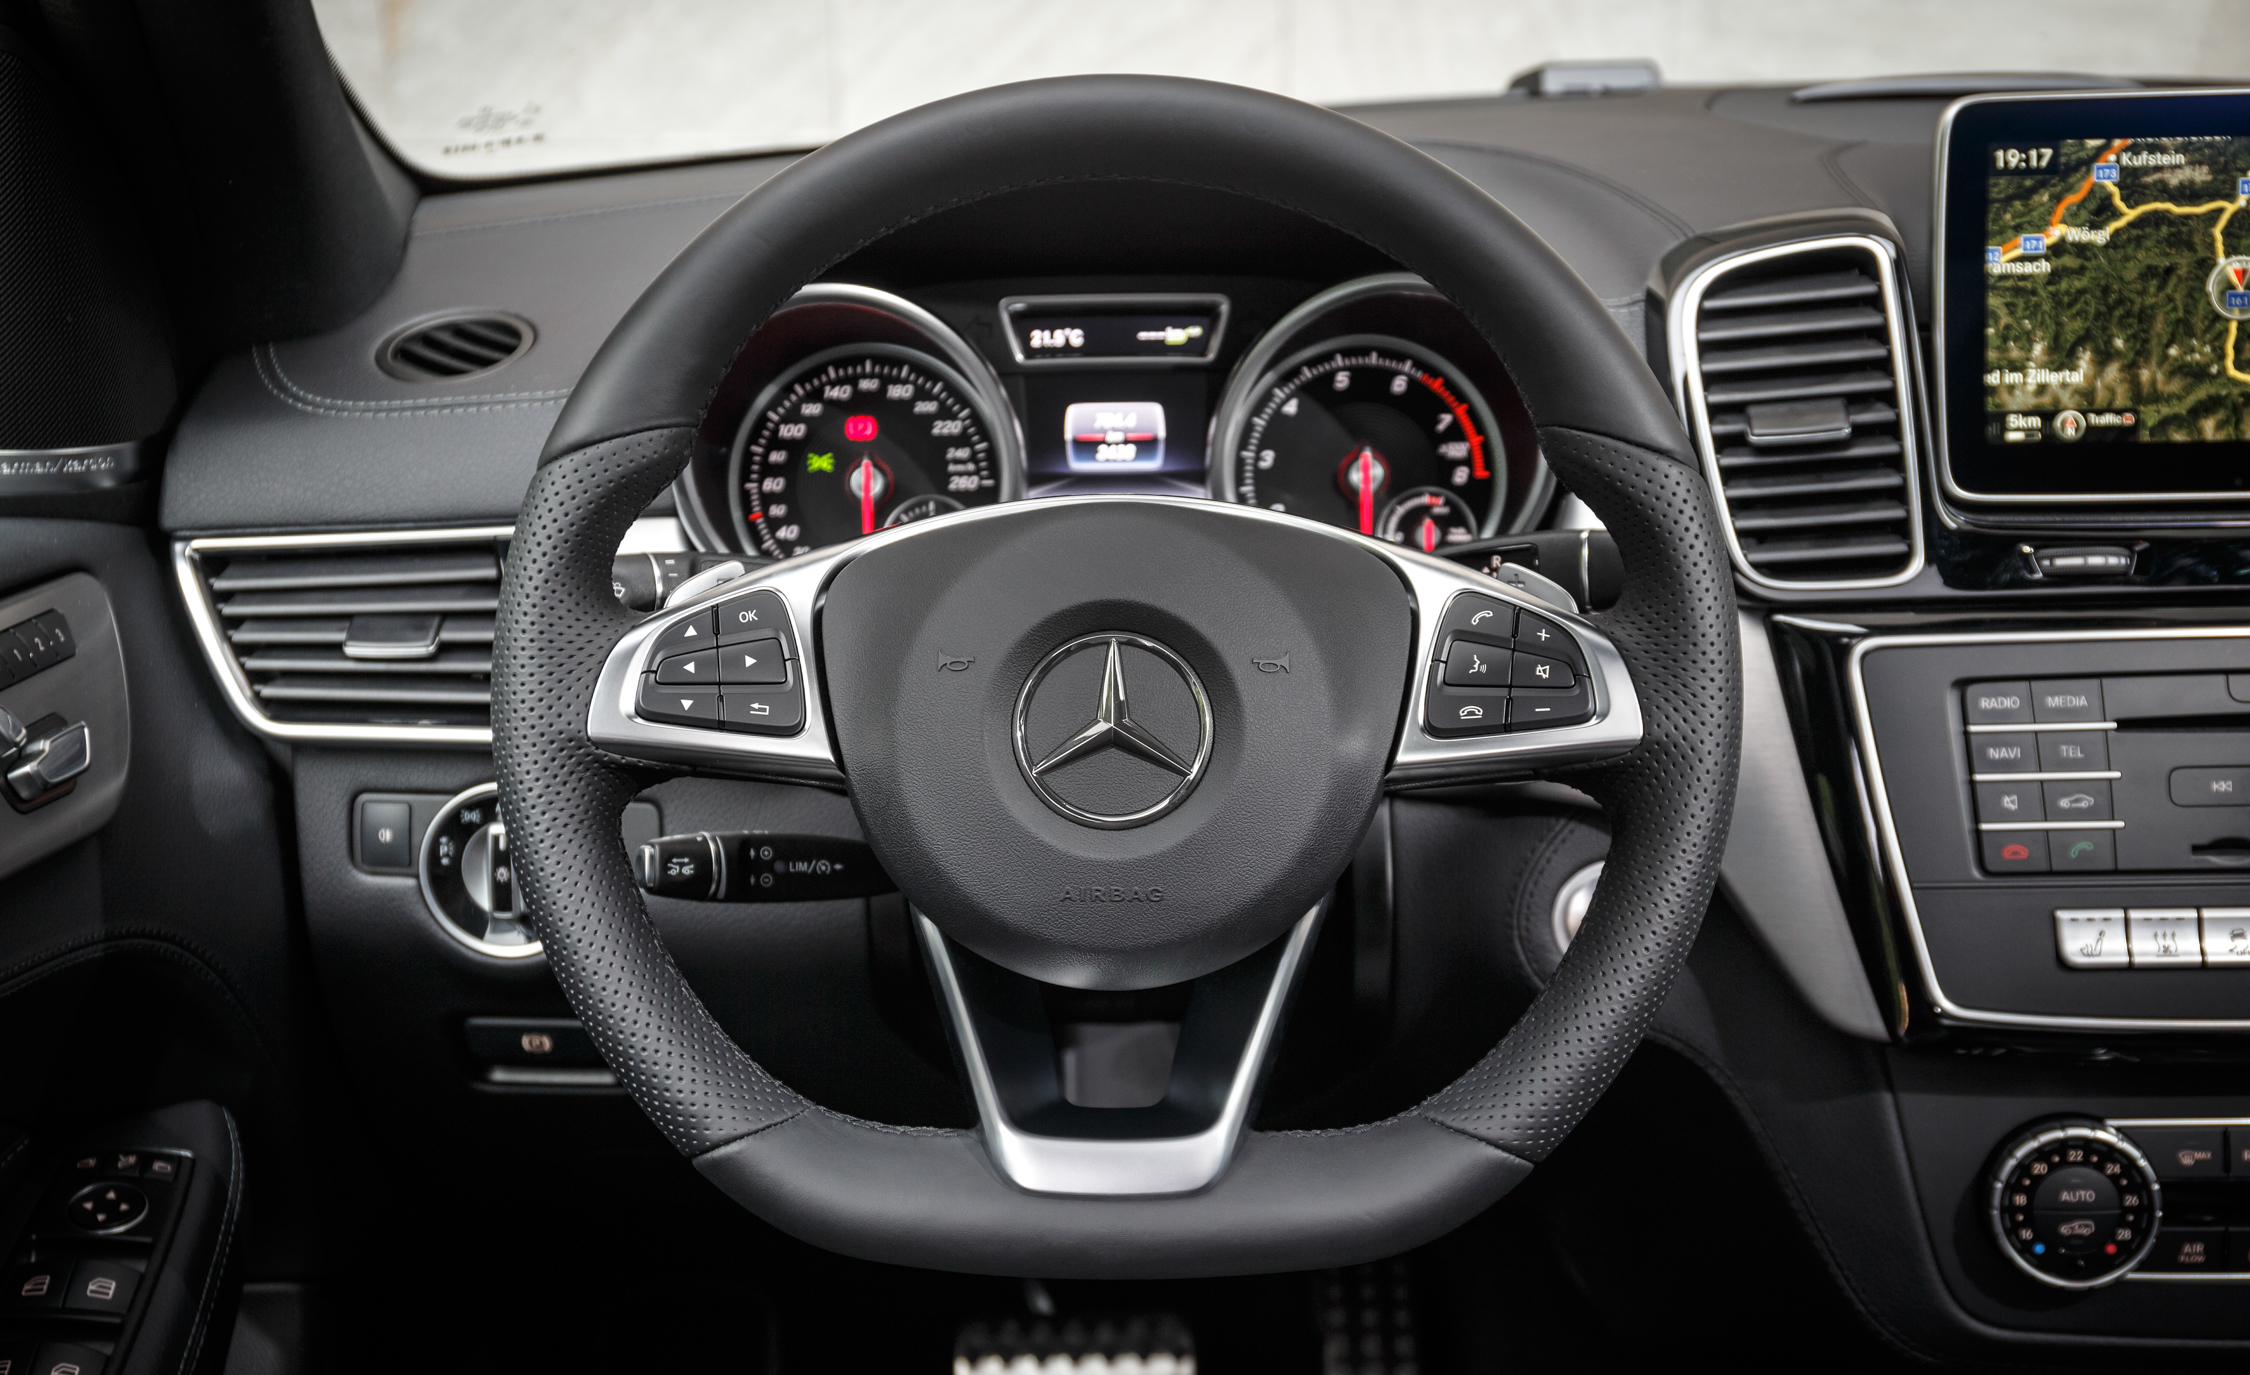 2016 Mercedes-Benz GLE500e 4MATIC Interior Cockpit